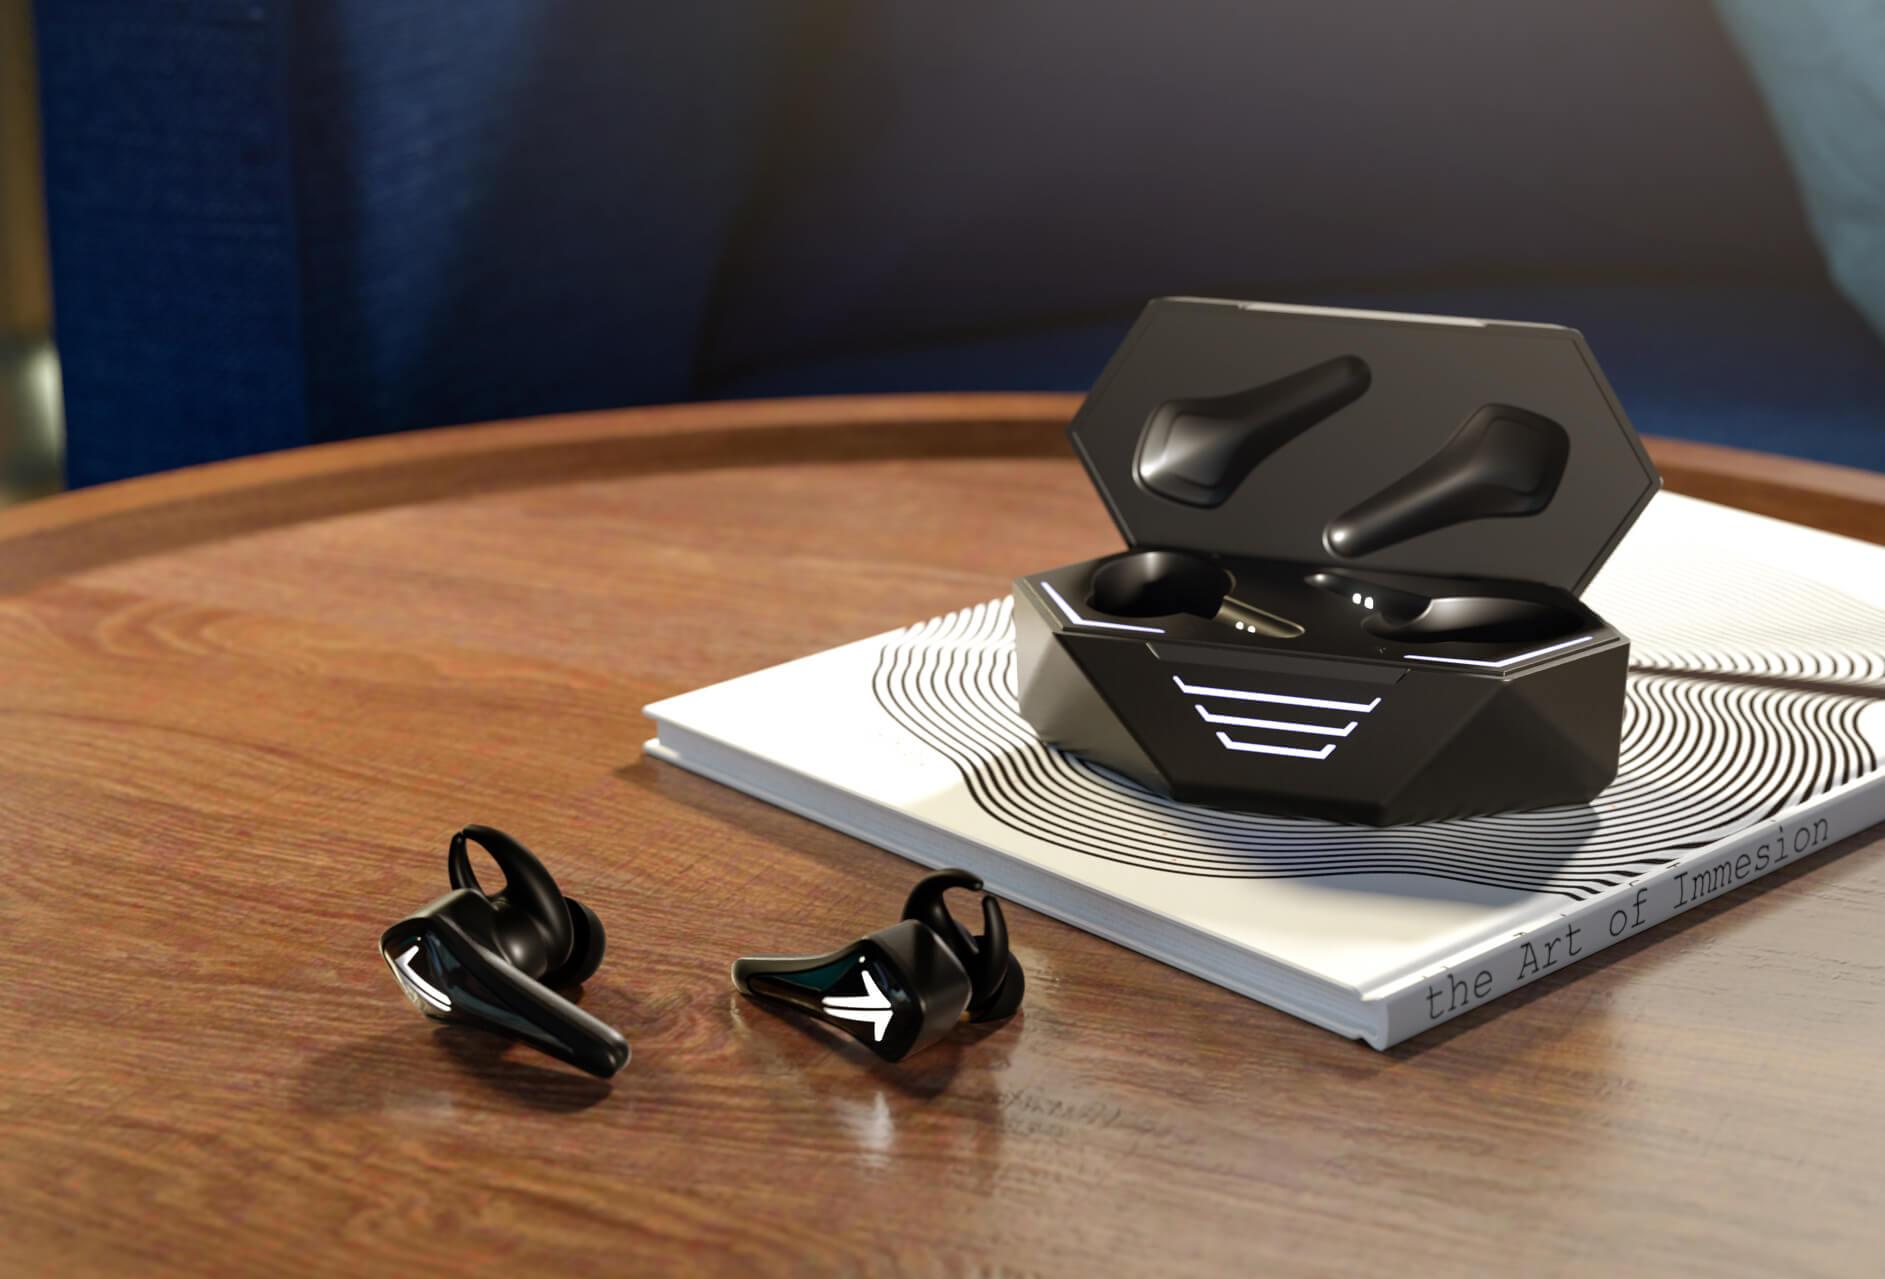 Saramonic SR BH60 R True Wireless Gaming Earbuds 15